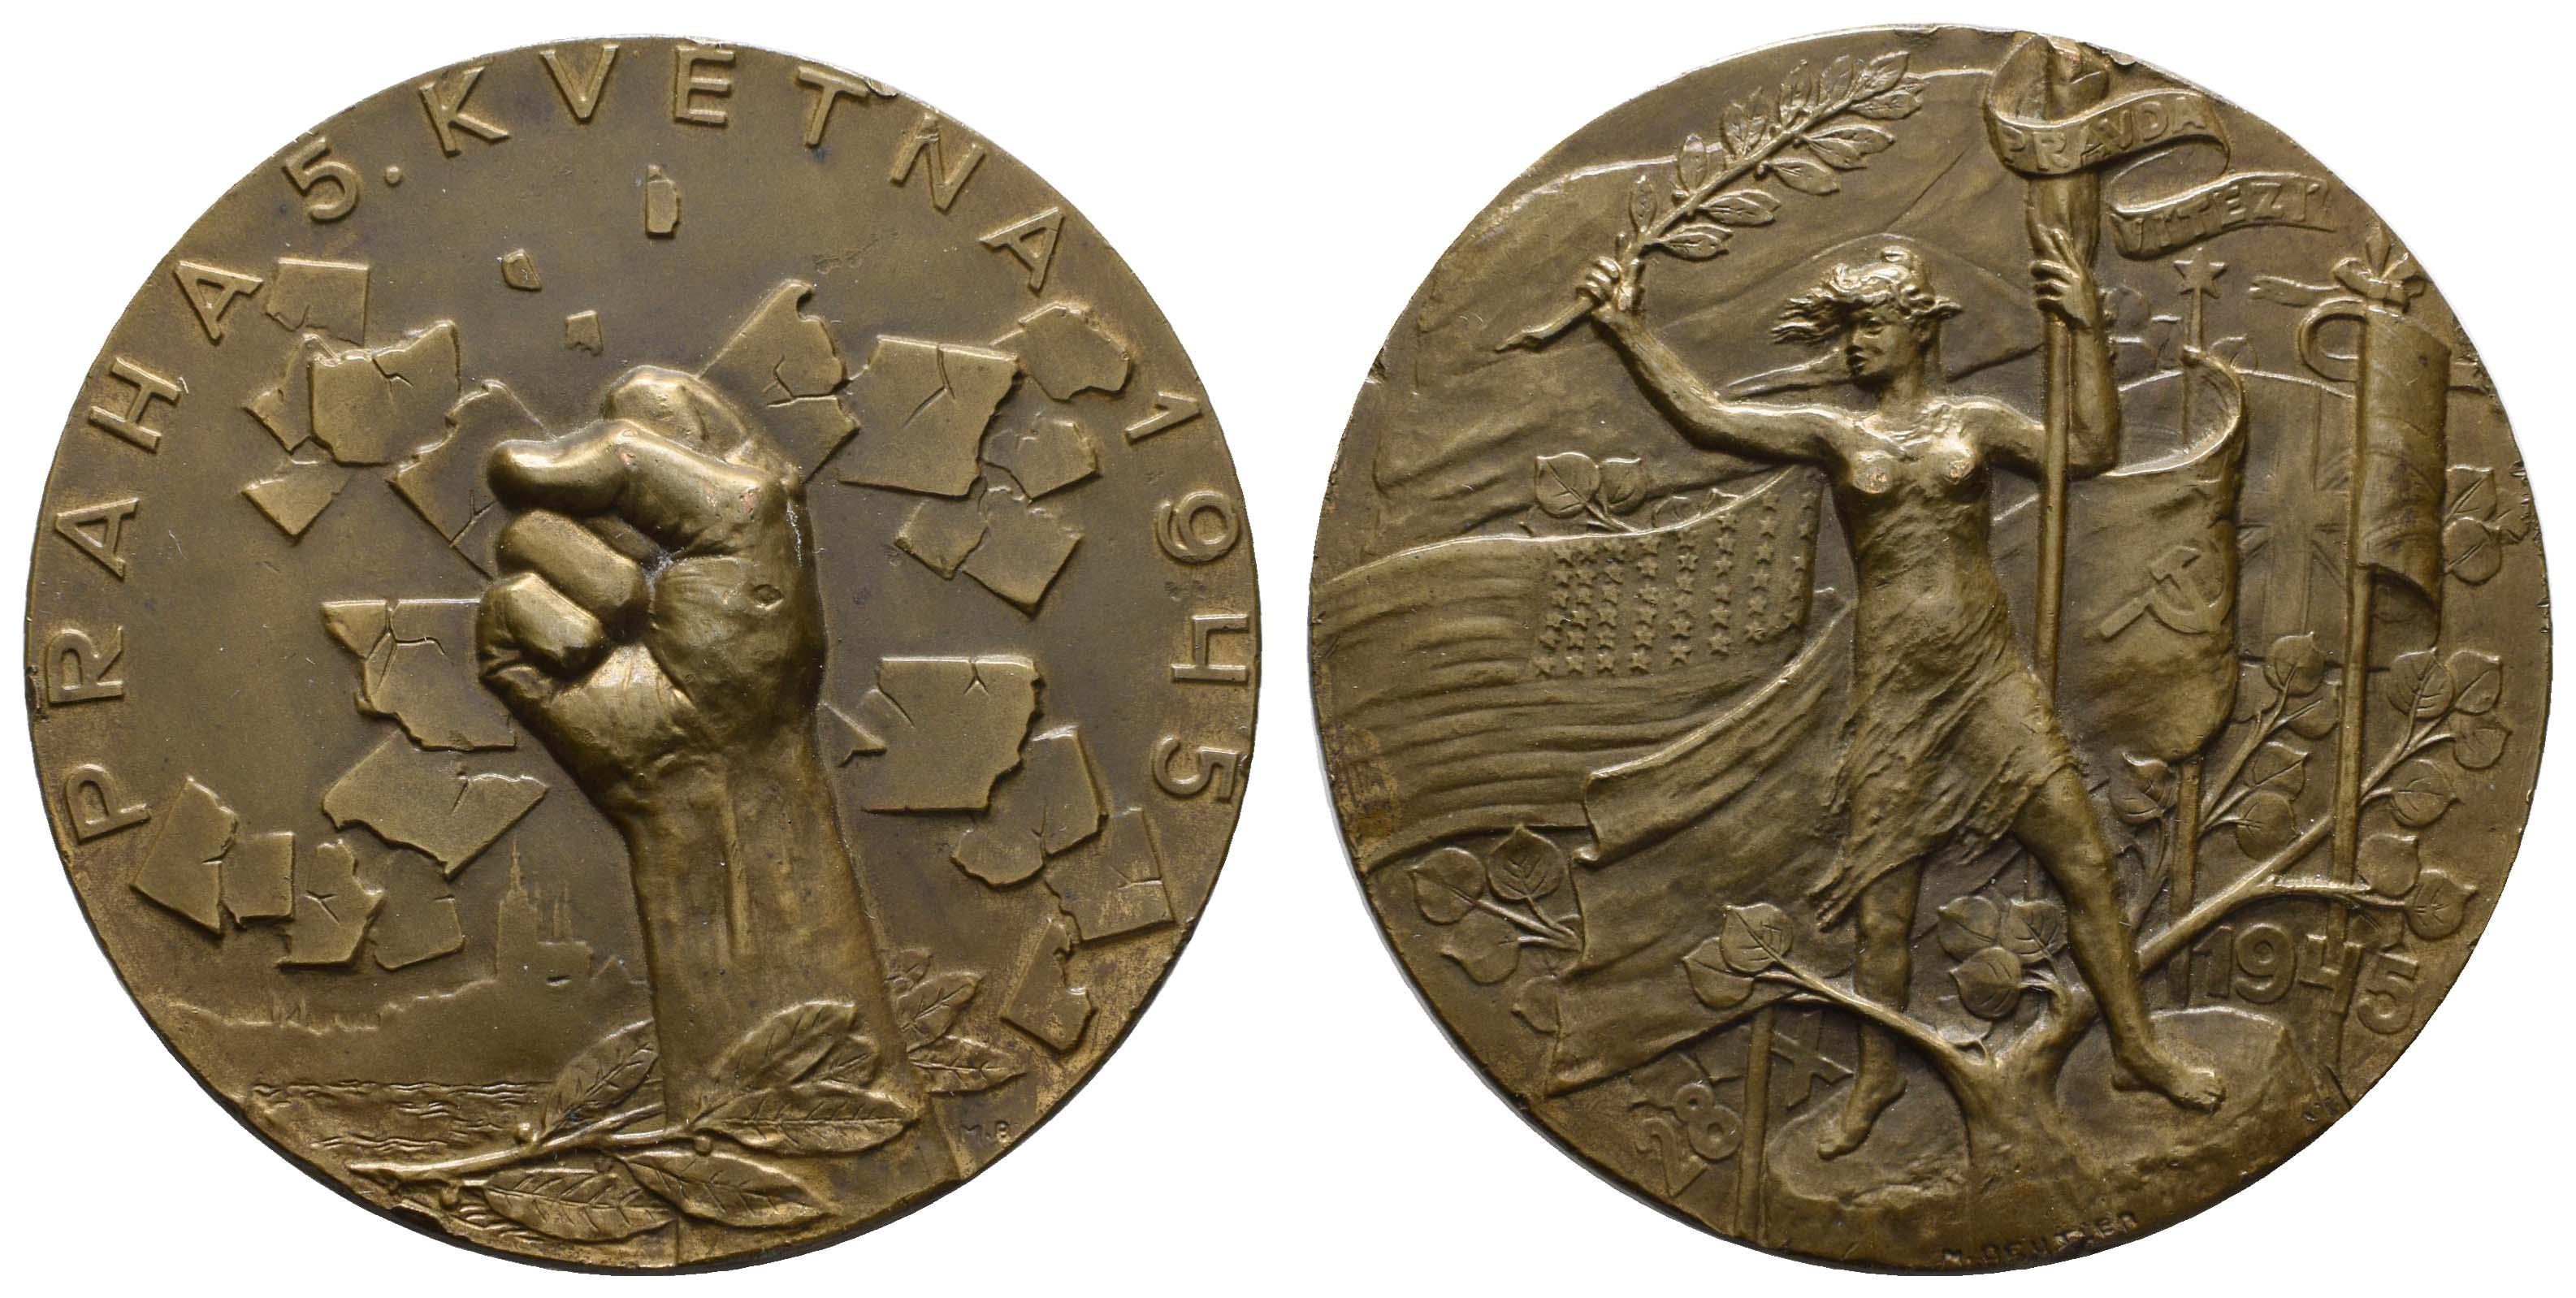 Lot 1827 - Medaillen_Sonstige Medaillen_Europa  -  Auktionshaus Ulrich Felzmann GmbH & Co. KG Auction 170 International Autumn Auction 2020 Day 2